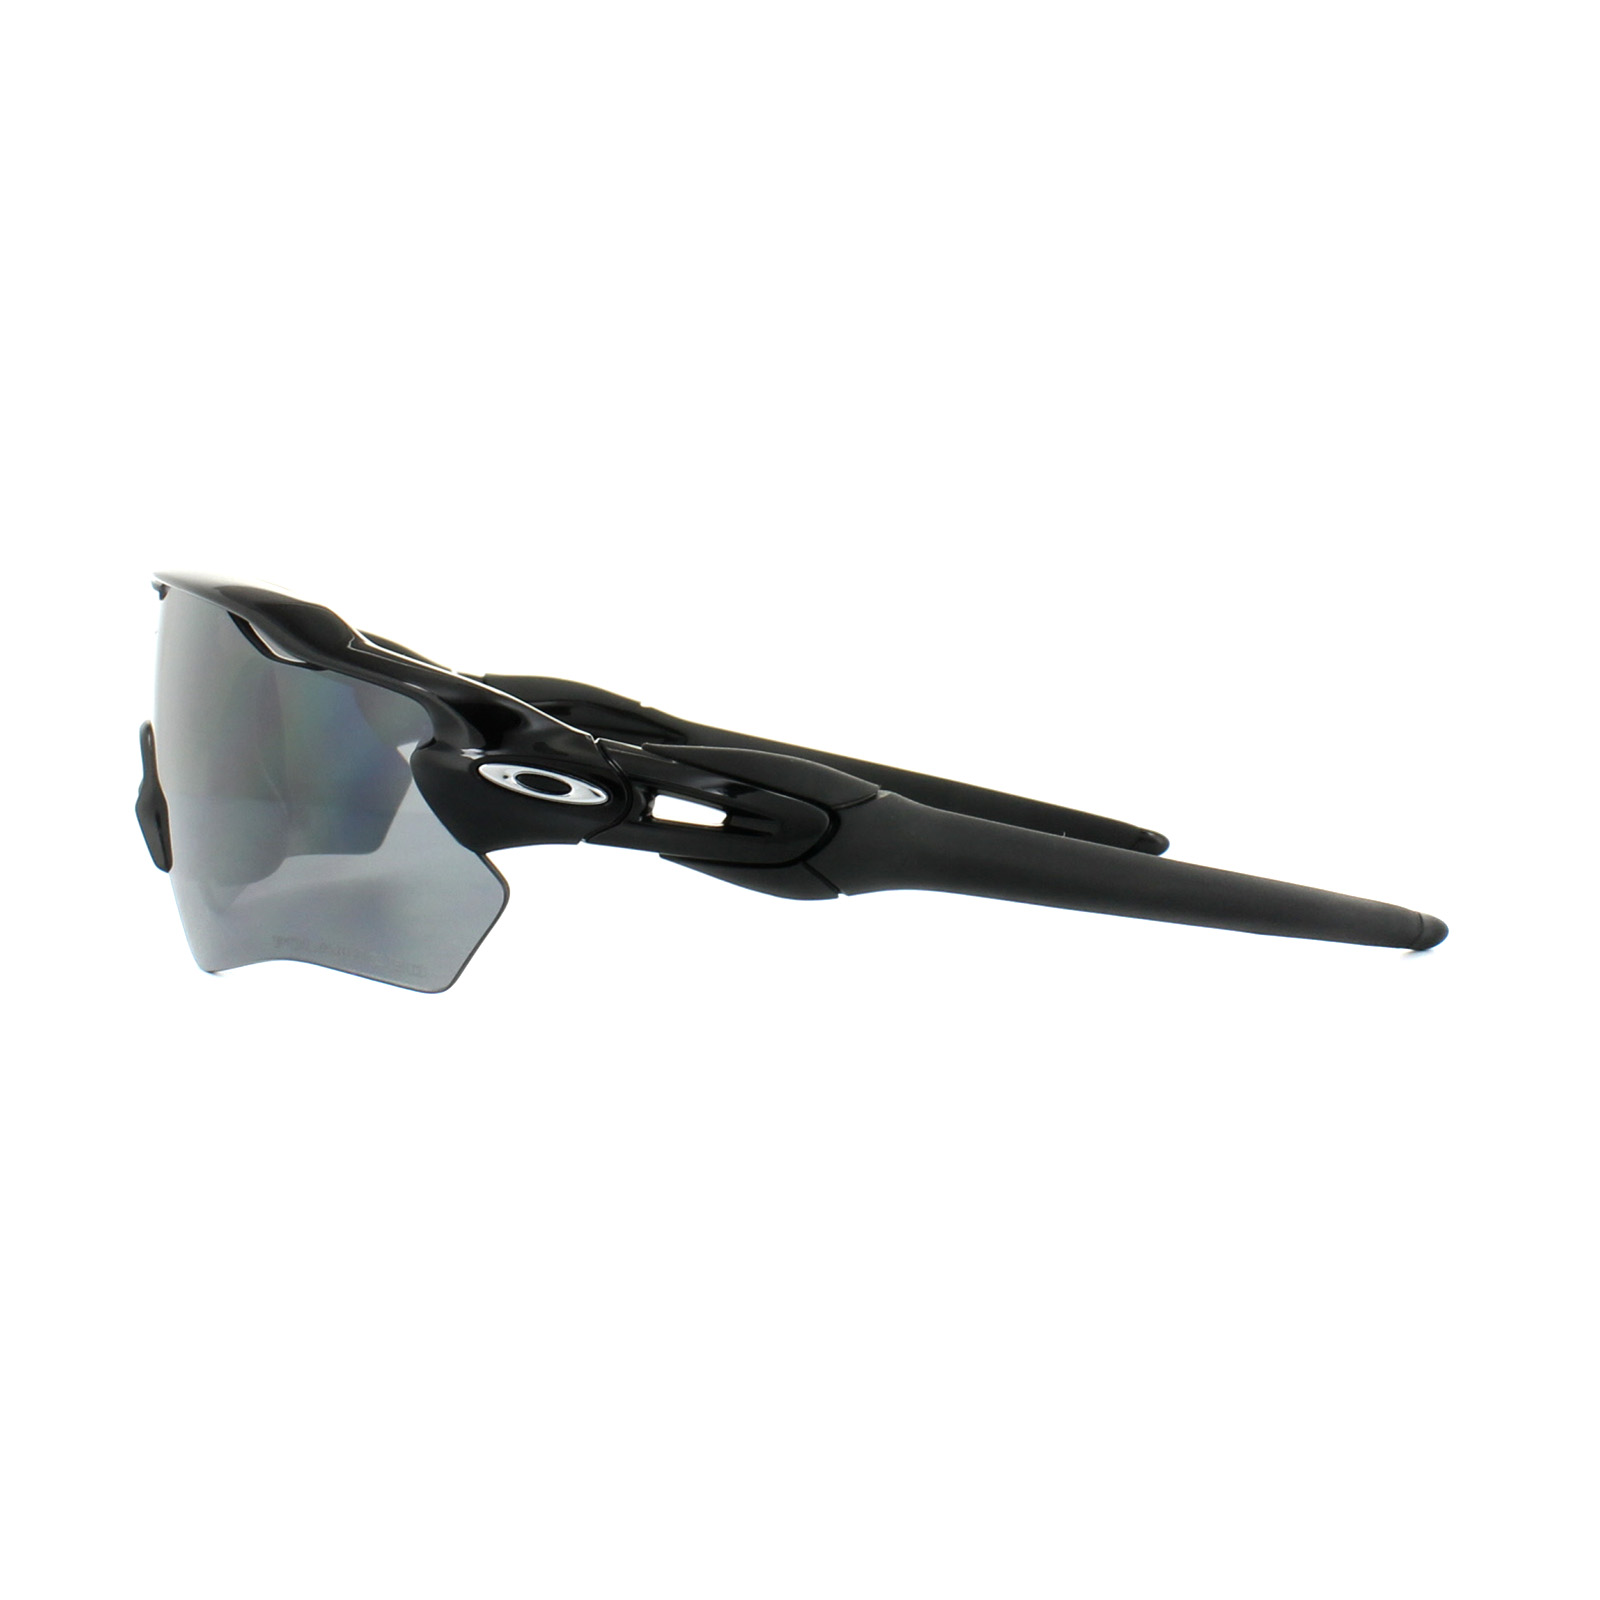 116cb13bbcc Sentinel Oakley Sunglasses Radar EV XS Path Youth OJ9001-07 Black Black  Iridium Polarized